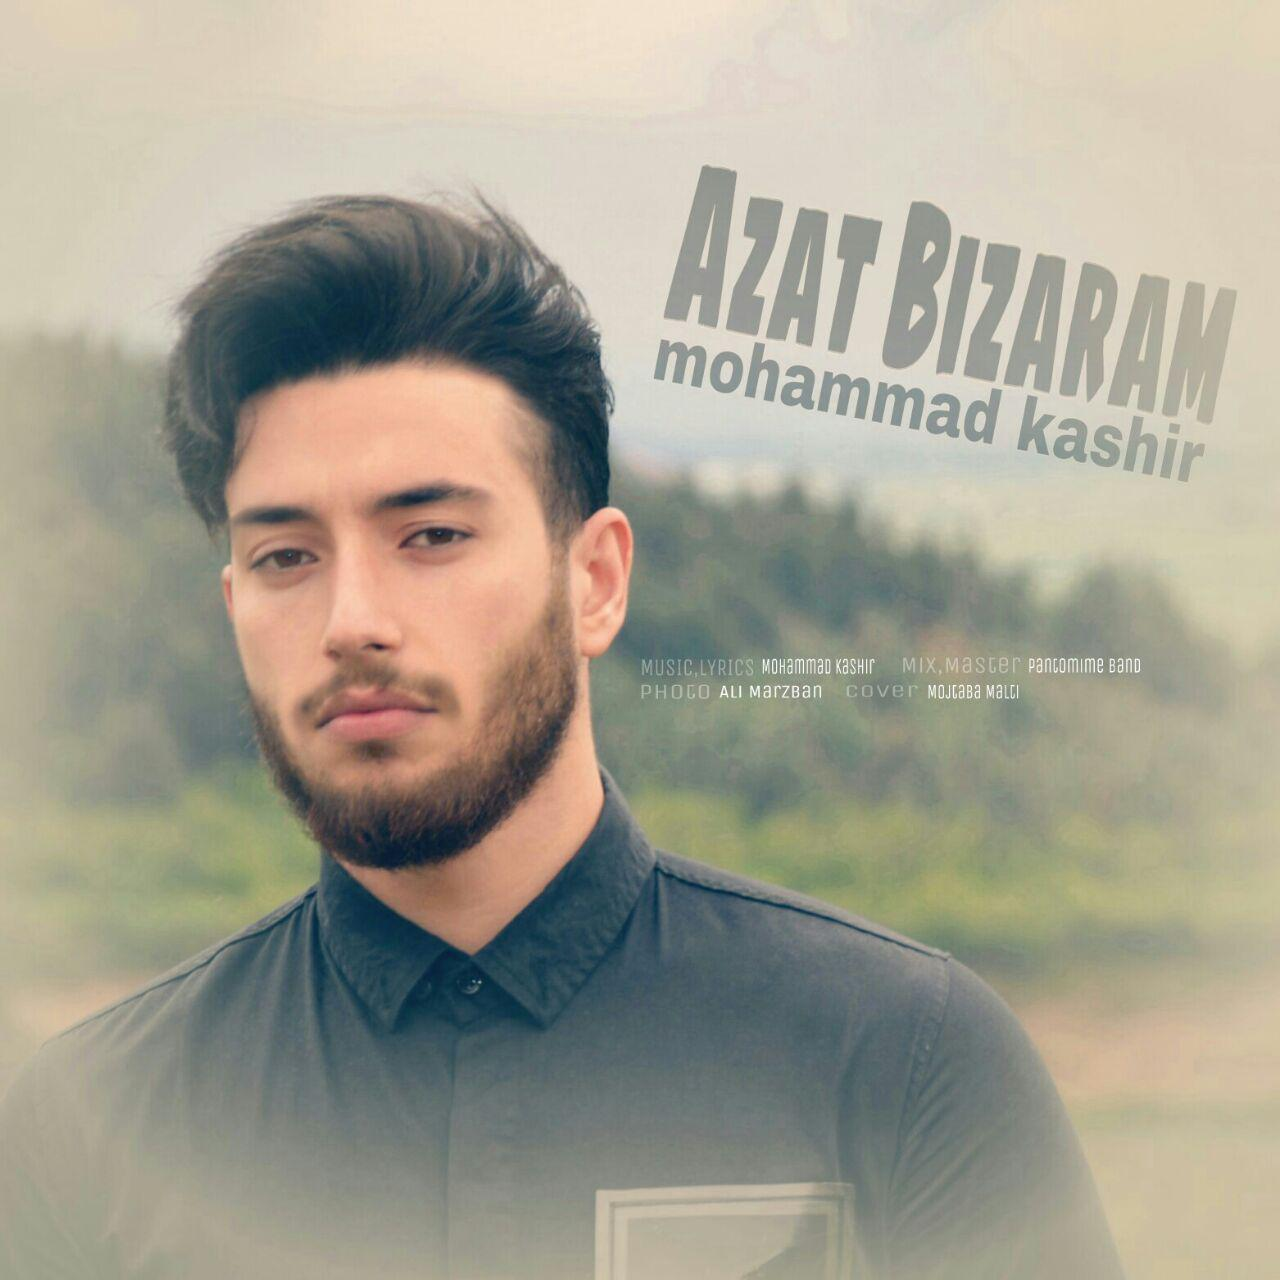 http://dl.rasanejavan.ir/radio97/02/12/Mohammad%20Kashir%20-%20Azat%20Bizaram.jpg